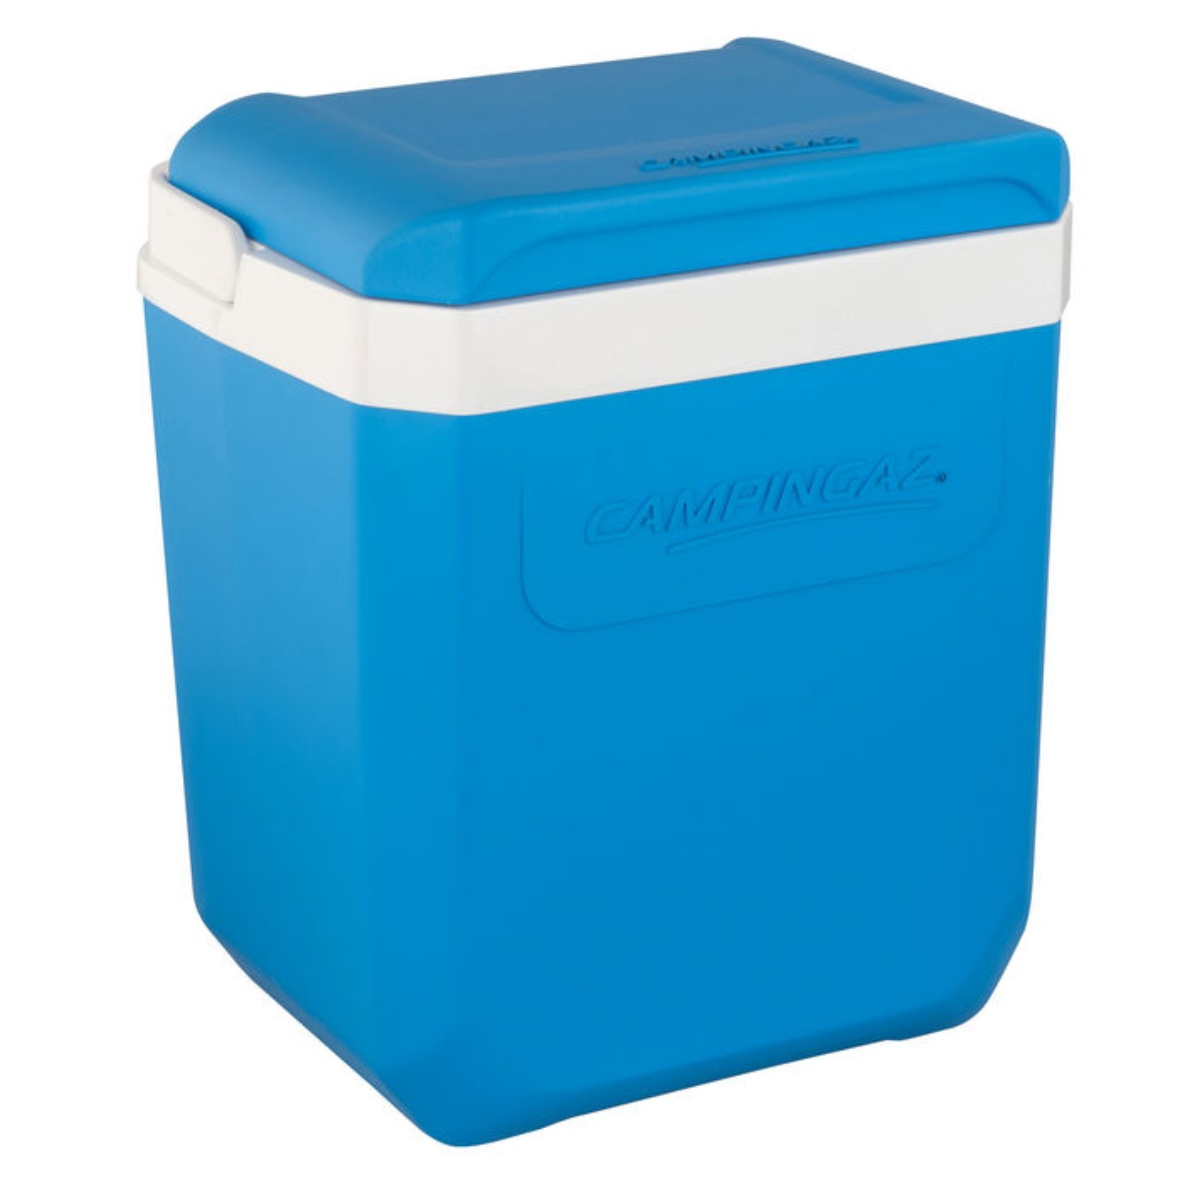 Chladící box CAMPINGAZ Icetime Plus 26l